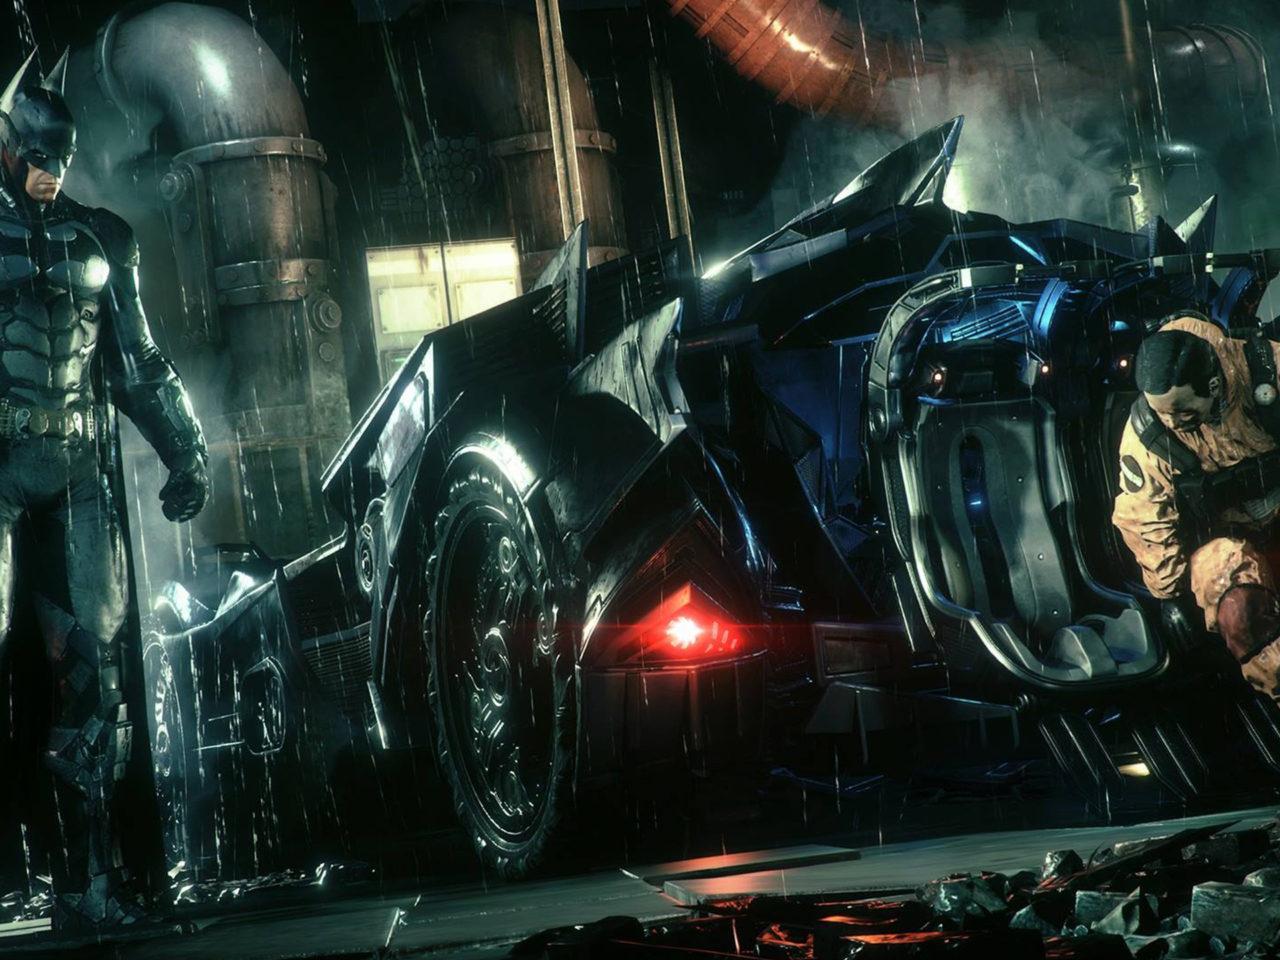 Free Car Hd Wallpapers Download Batman Arkham Knight Beth Car Hd Wallpaper Download For